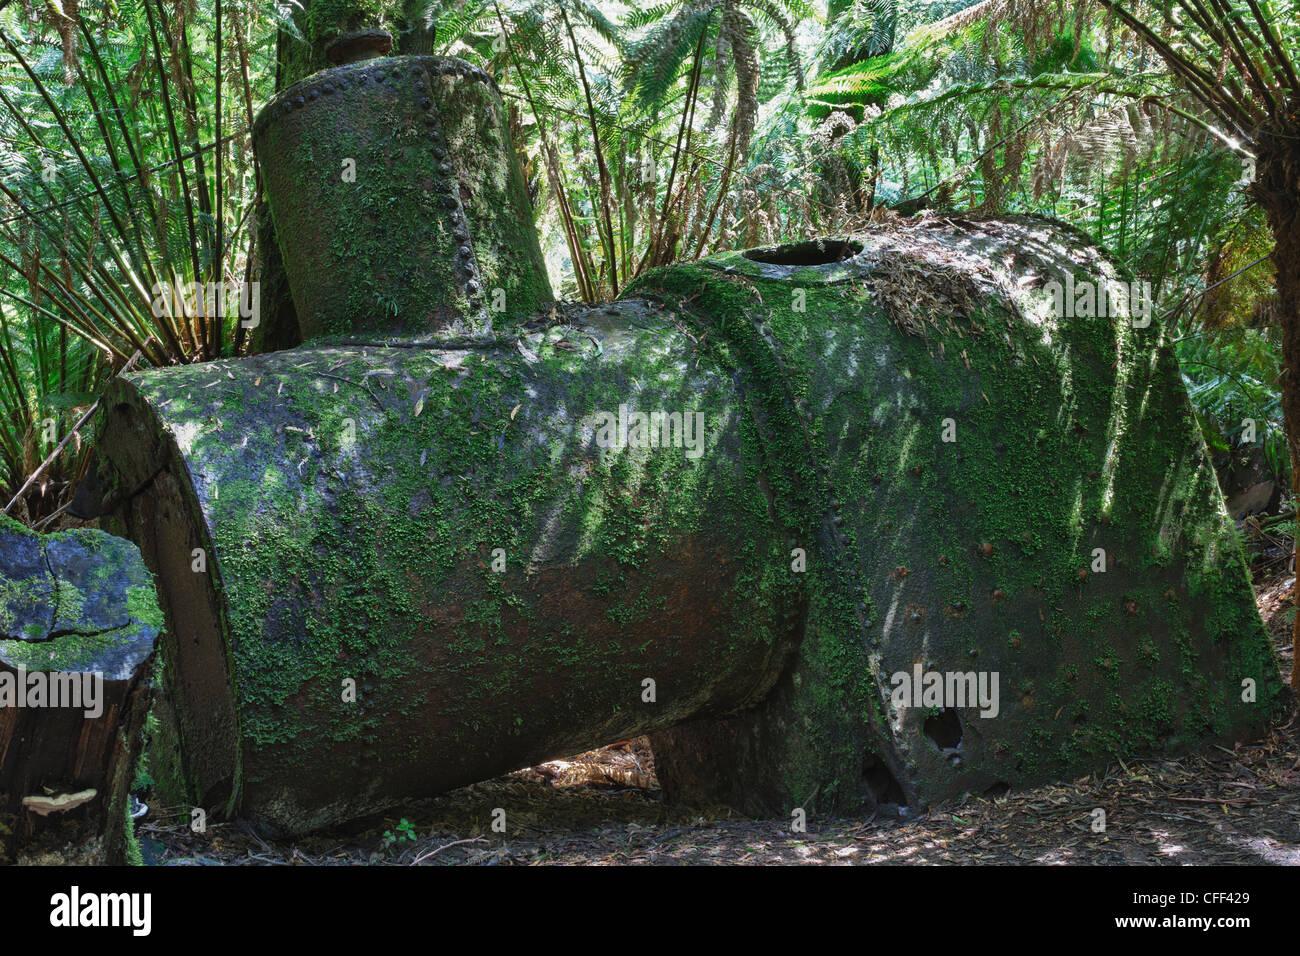 abandoned steam boiler, near Triplet falls, Victoria, Australia - Stock Image